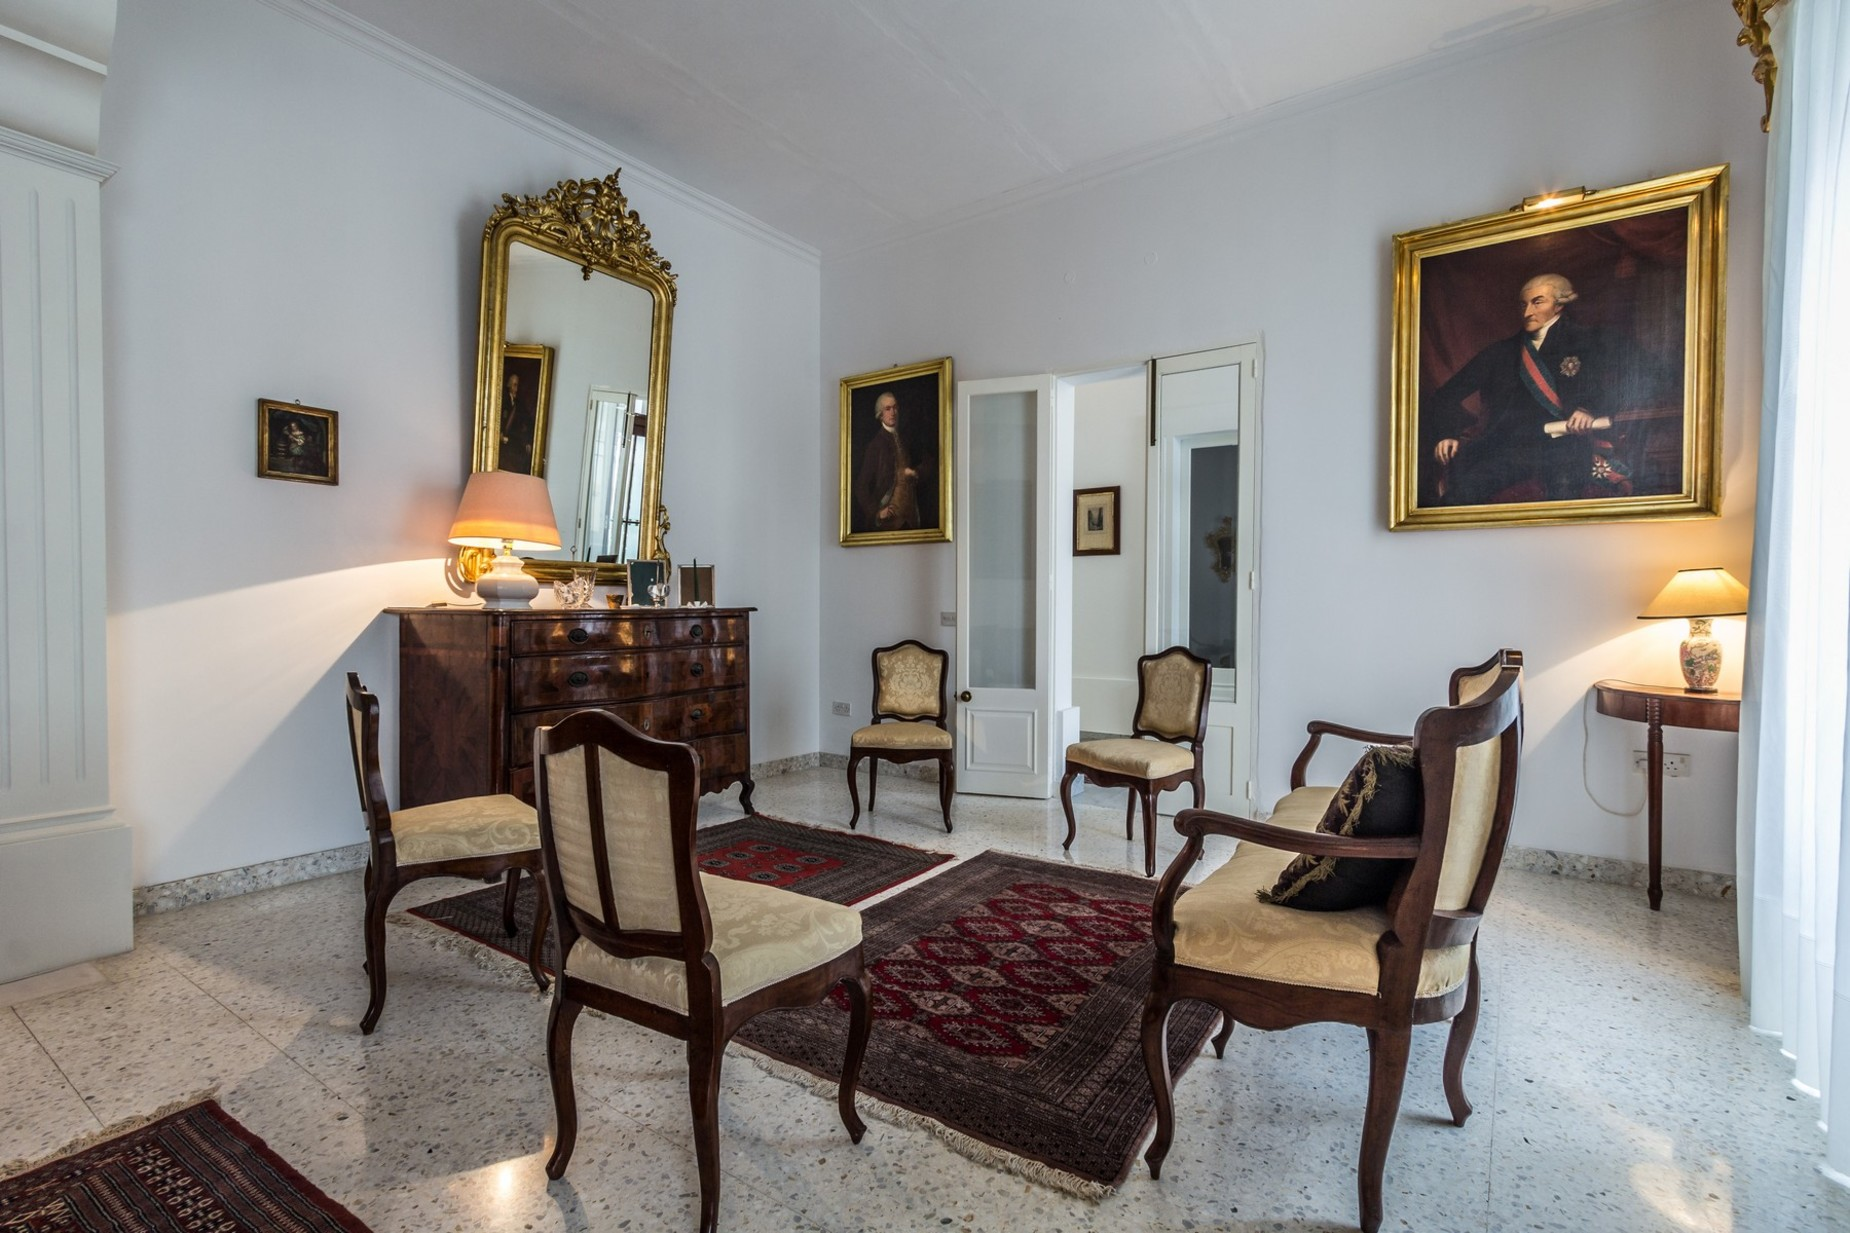 5 bed Villa For Rent in St Julian's, St Julian's - thumb 5